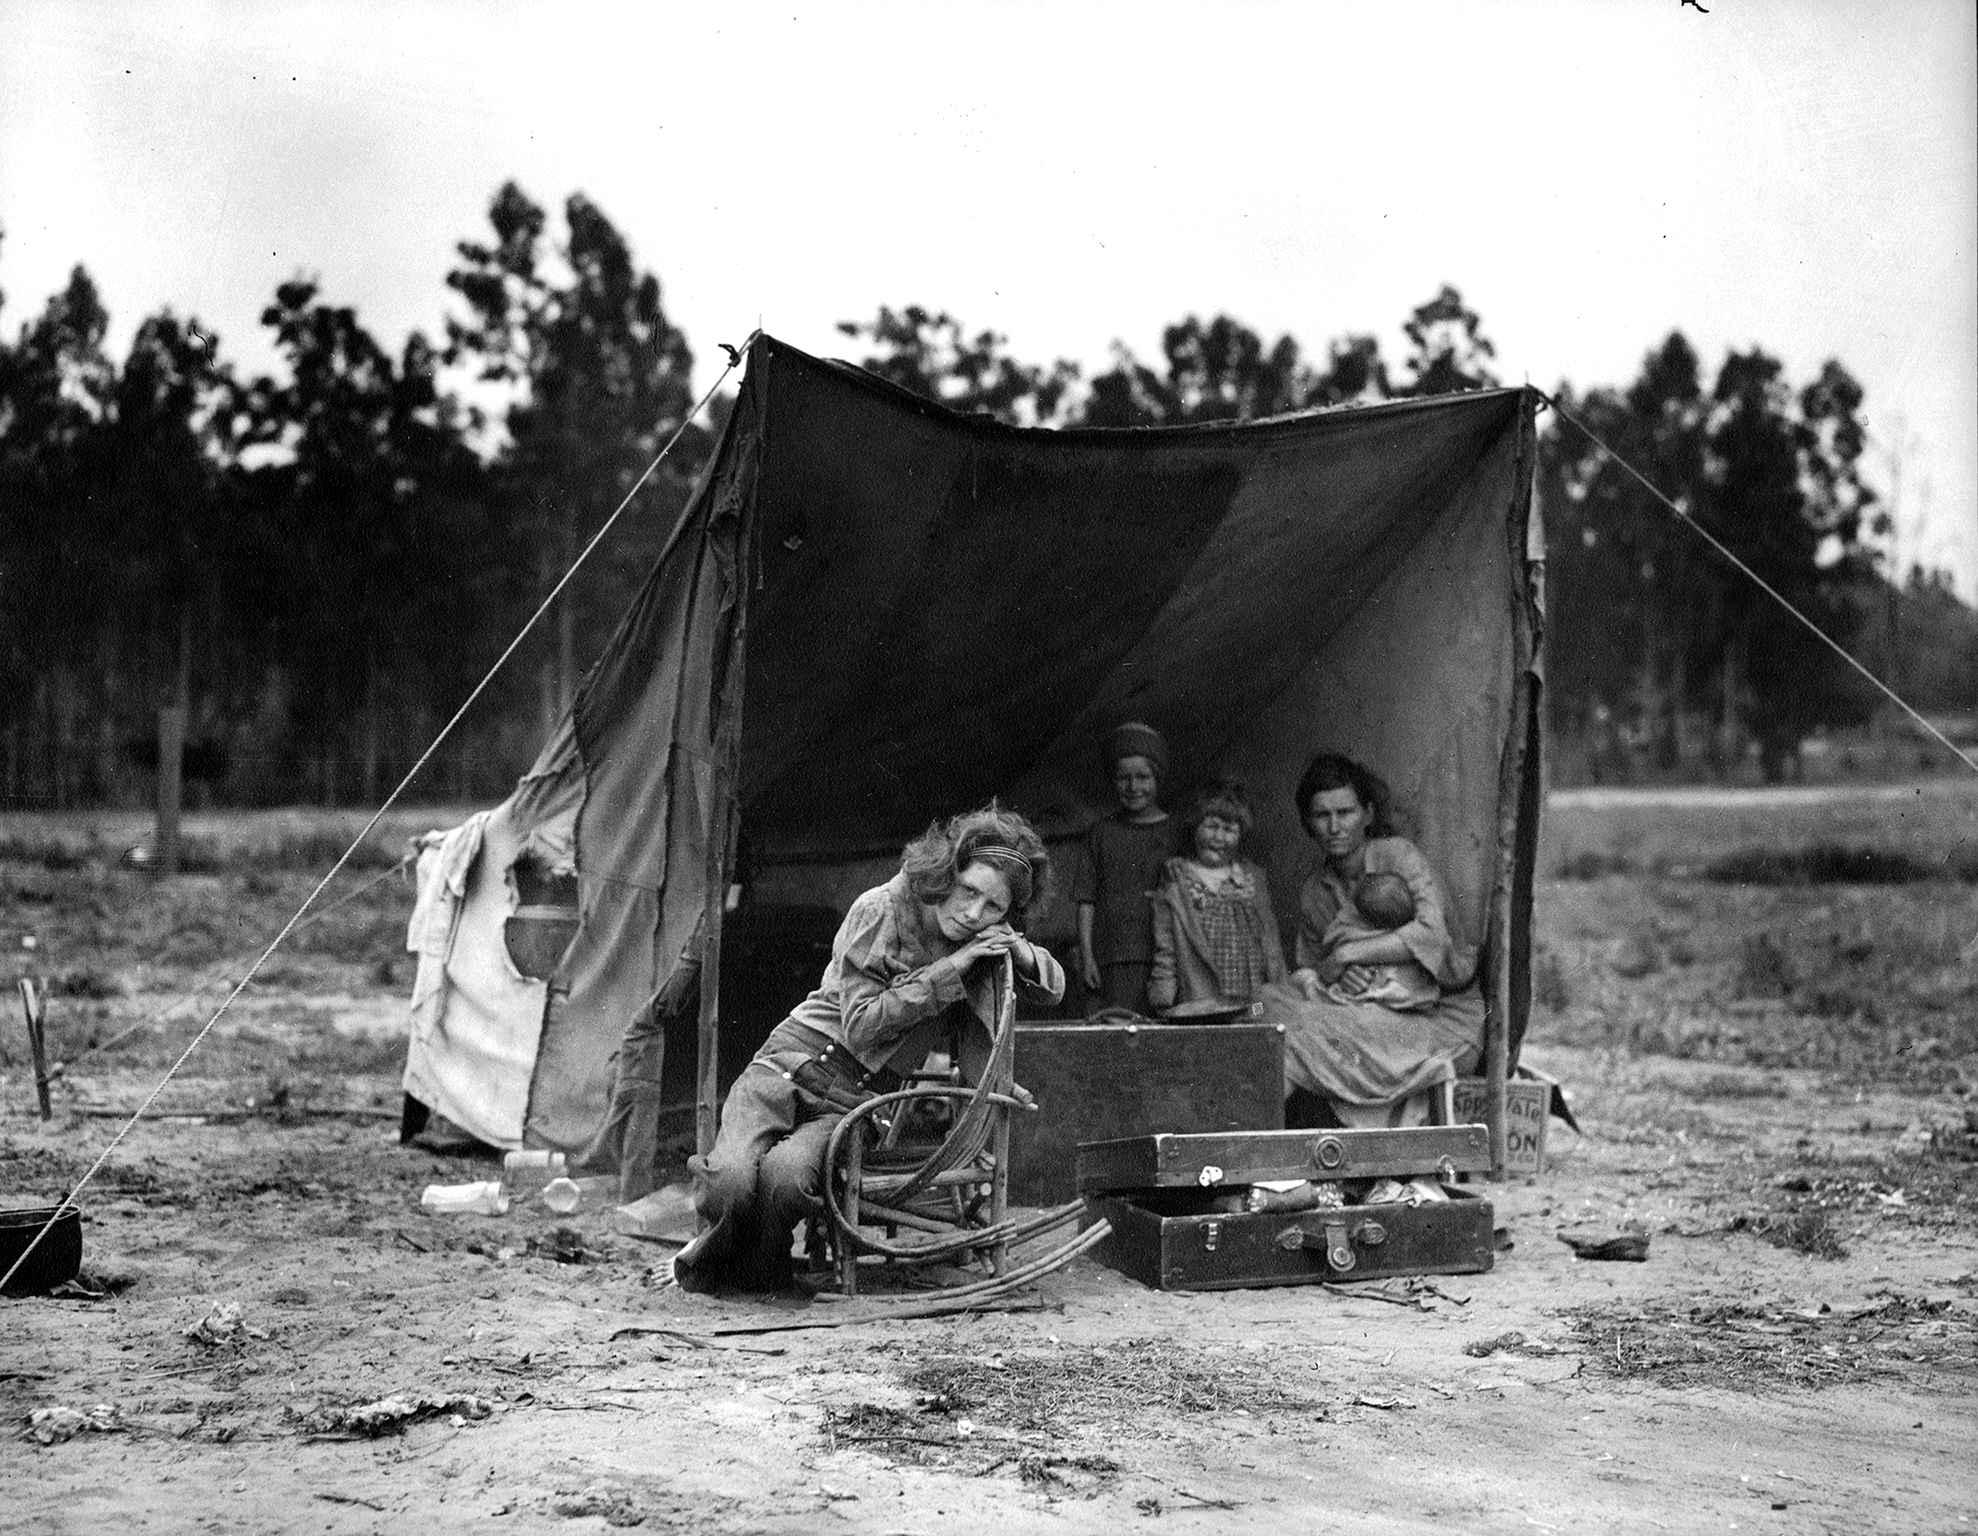 dorothea-lange-Migrants Family-1936.jpg